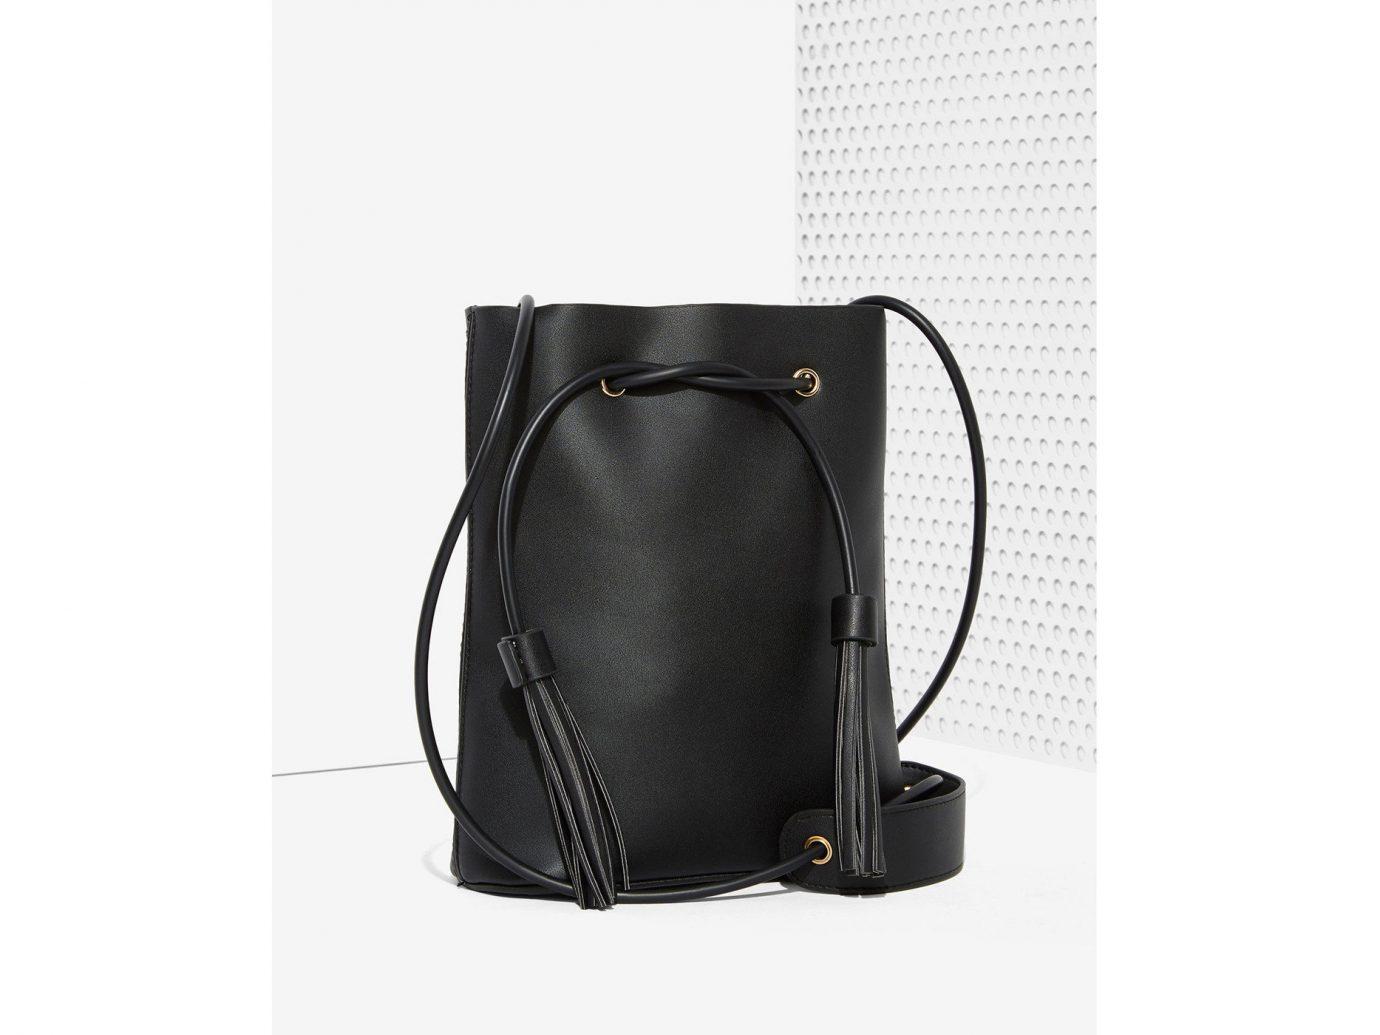 Style + Design bag indoor black product leather handbag brand hand luggage